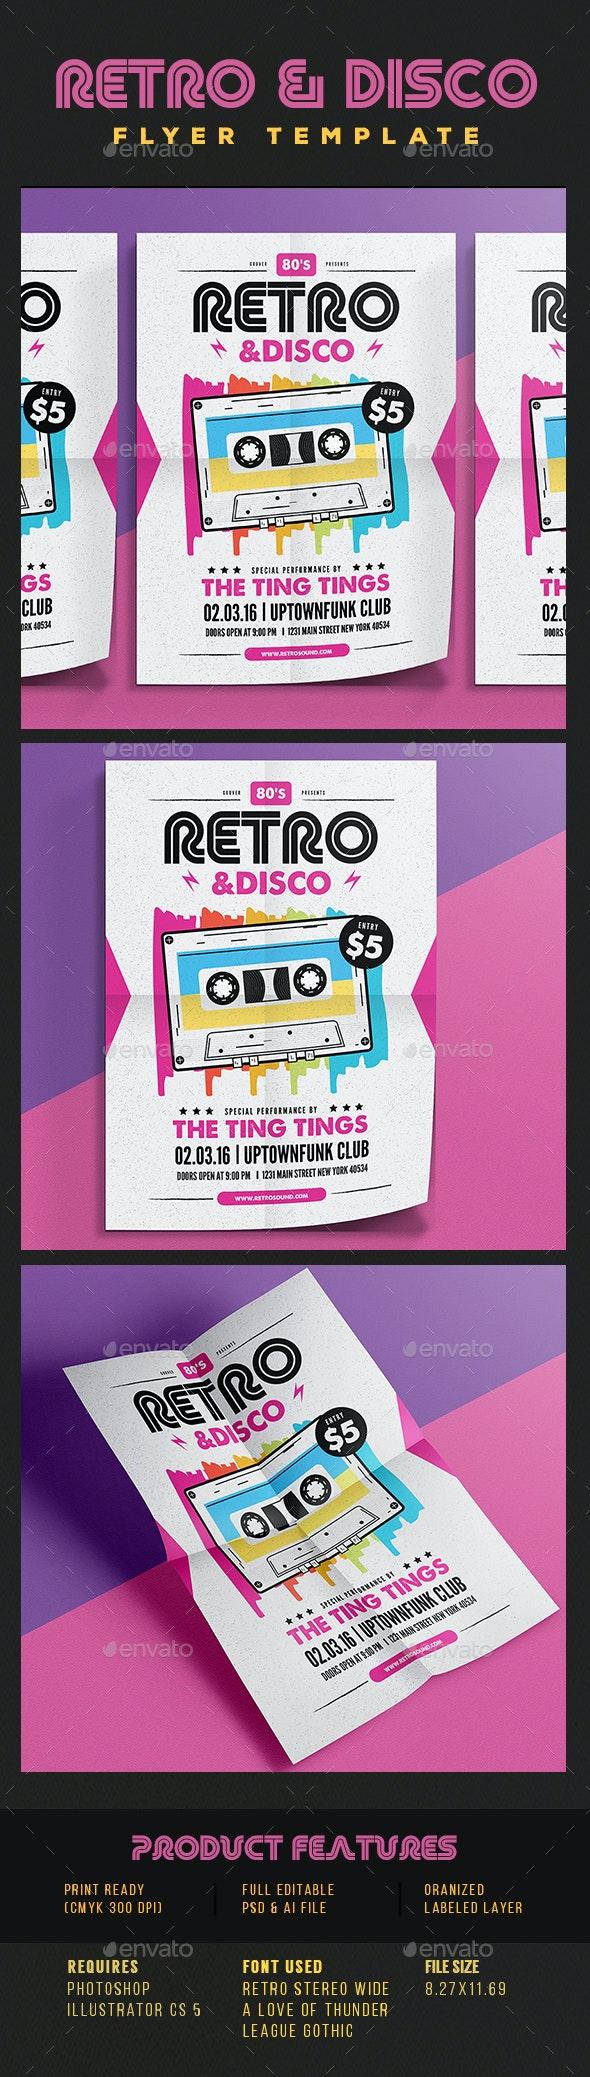 Retro Disco Flyer - Concerts Events